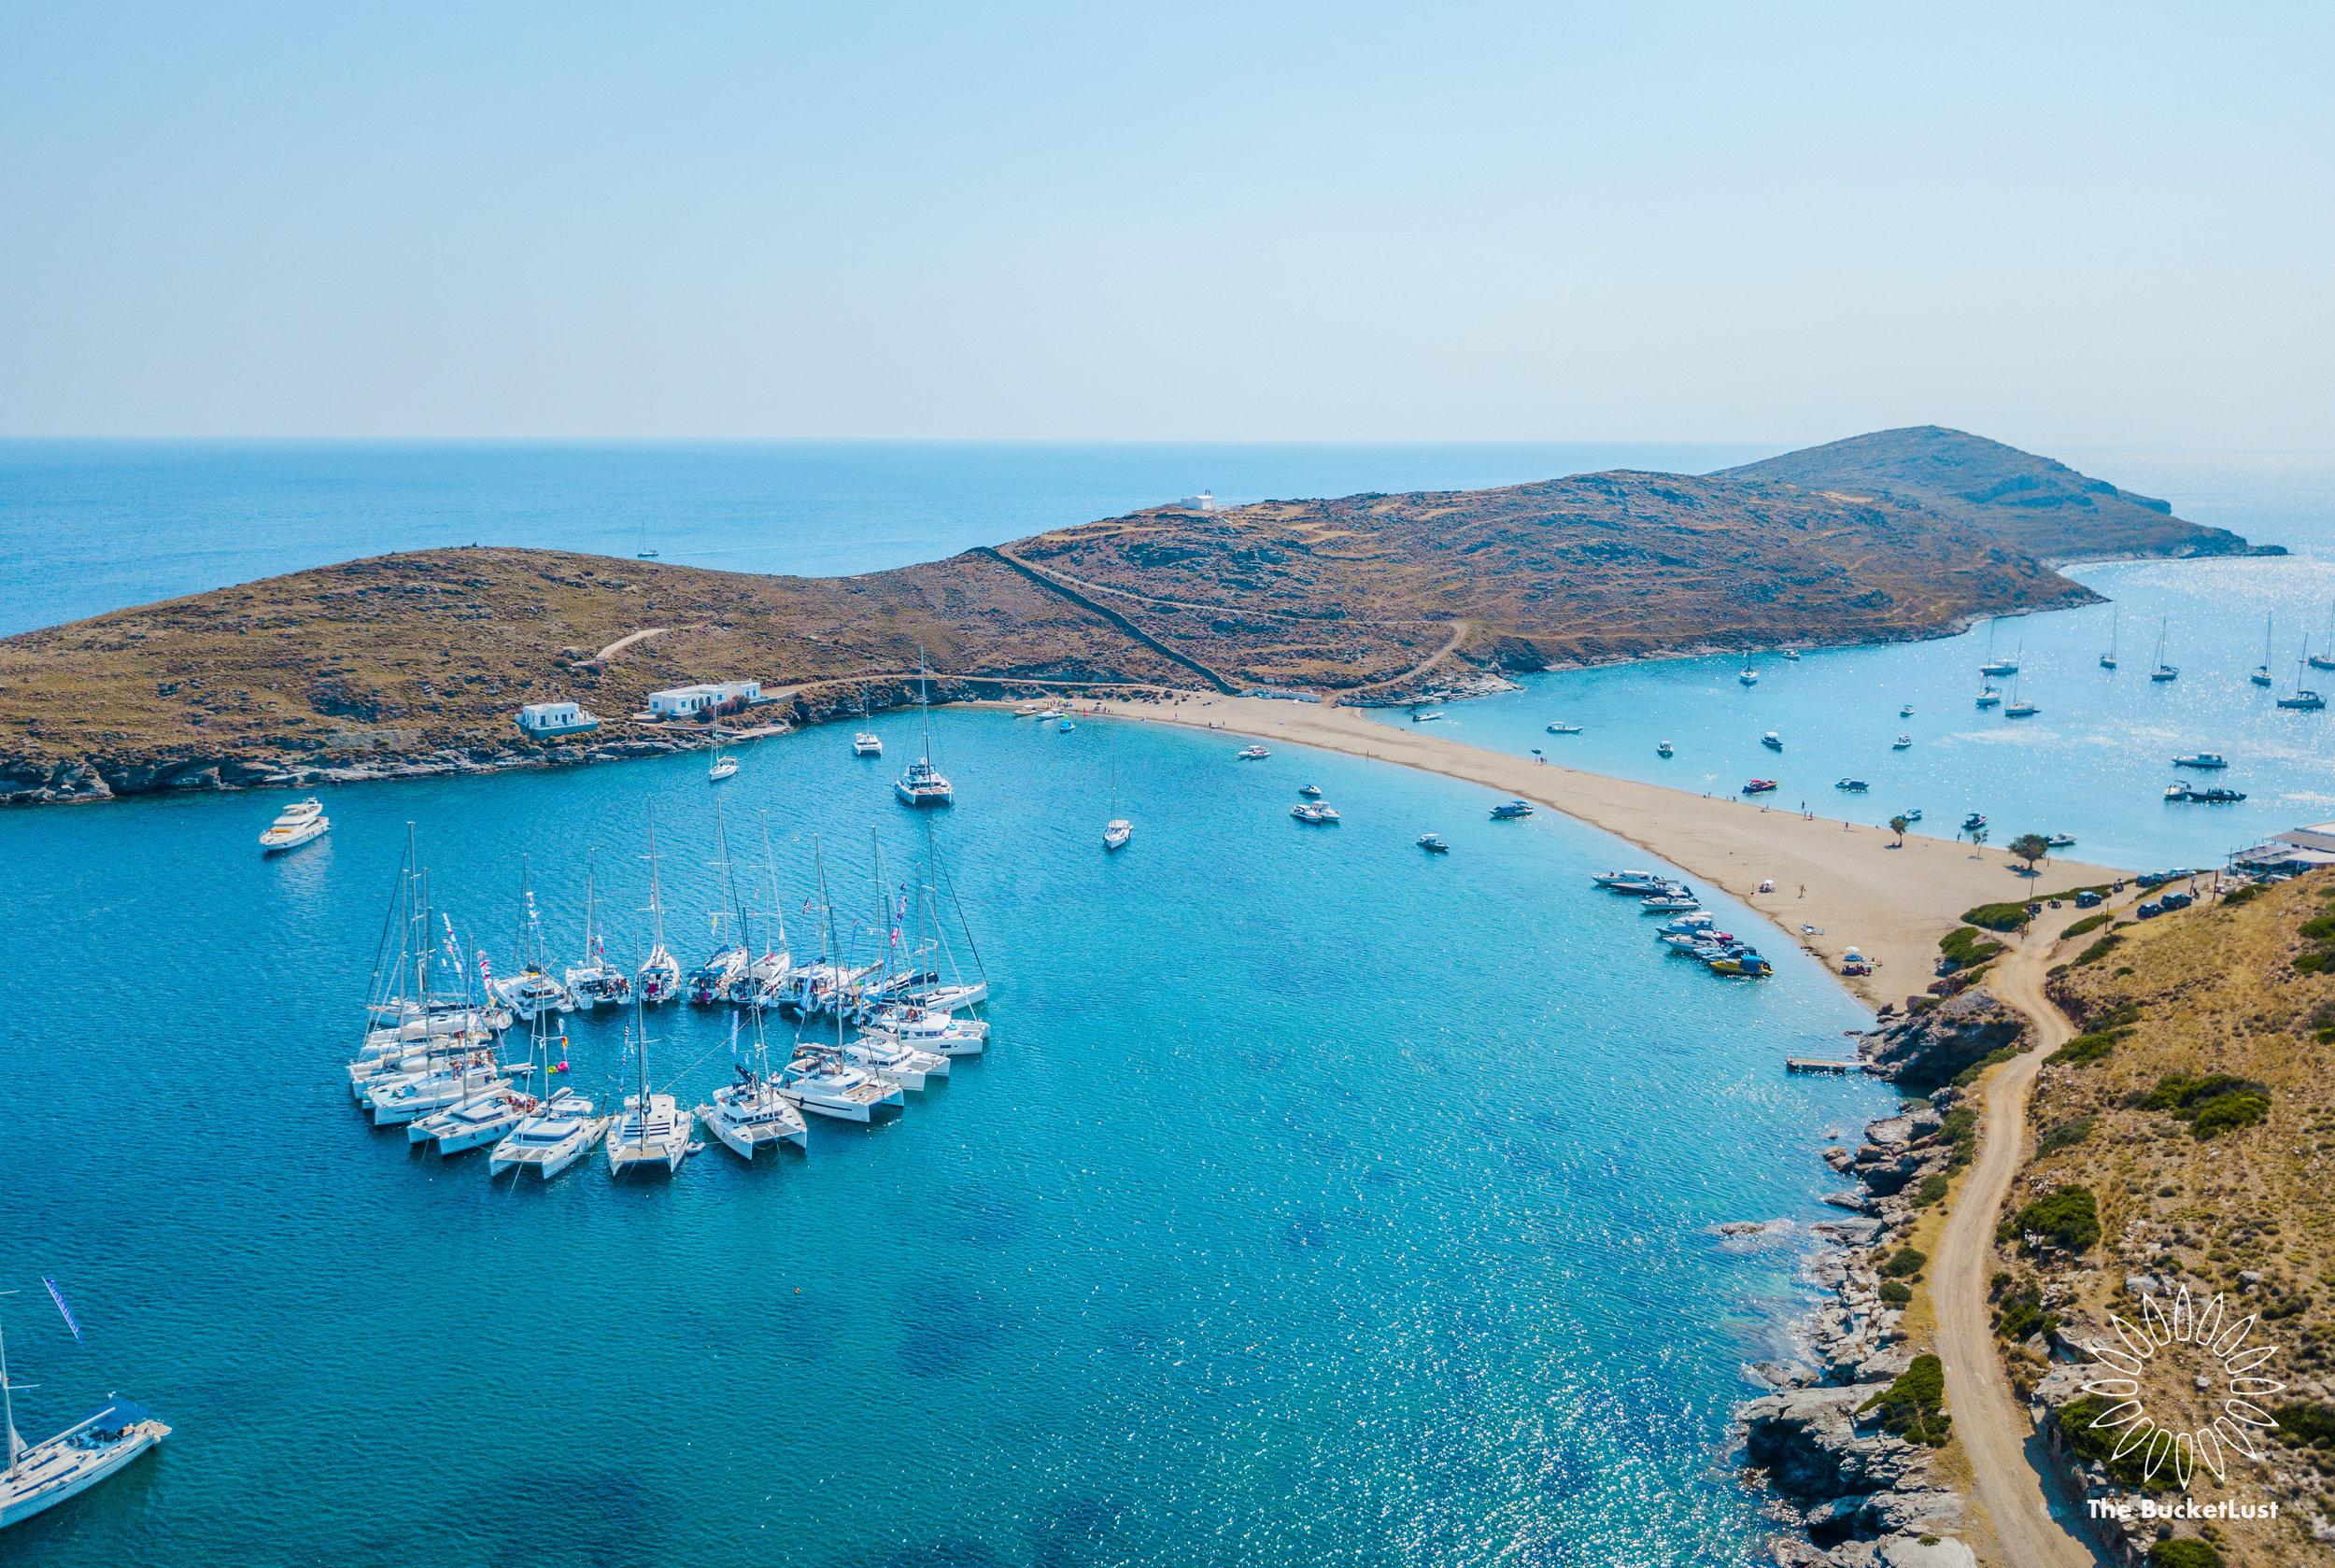 Circle Raft, Greece - The Mykonos Route